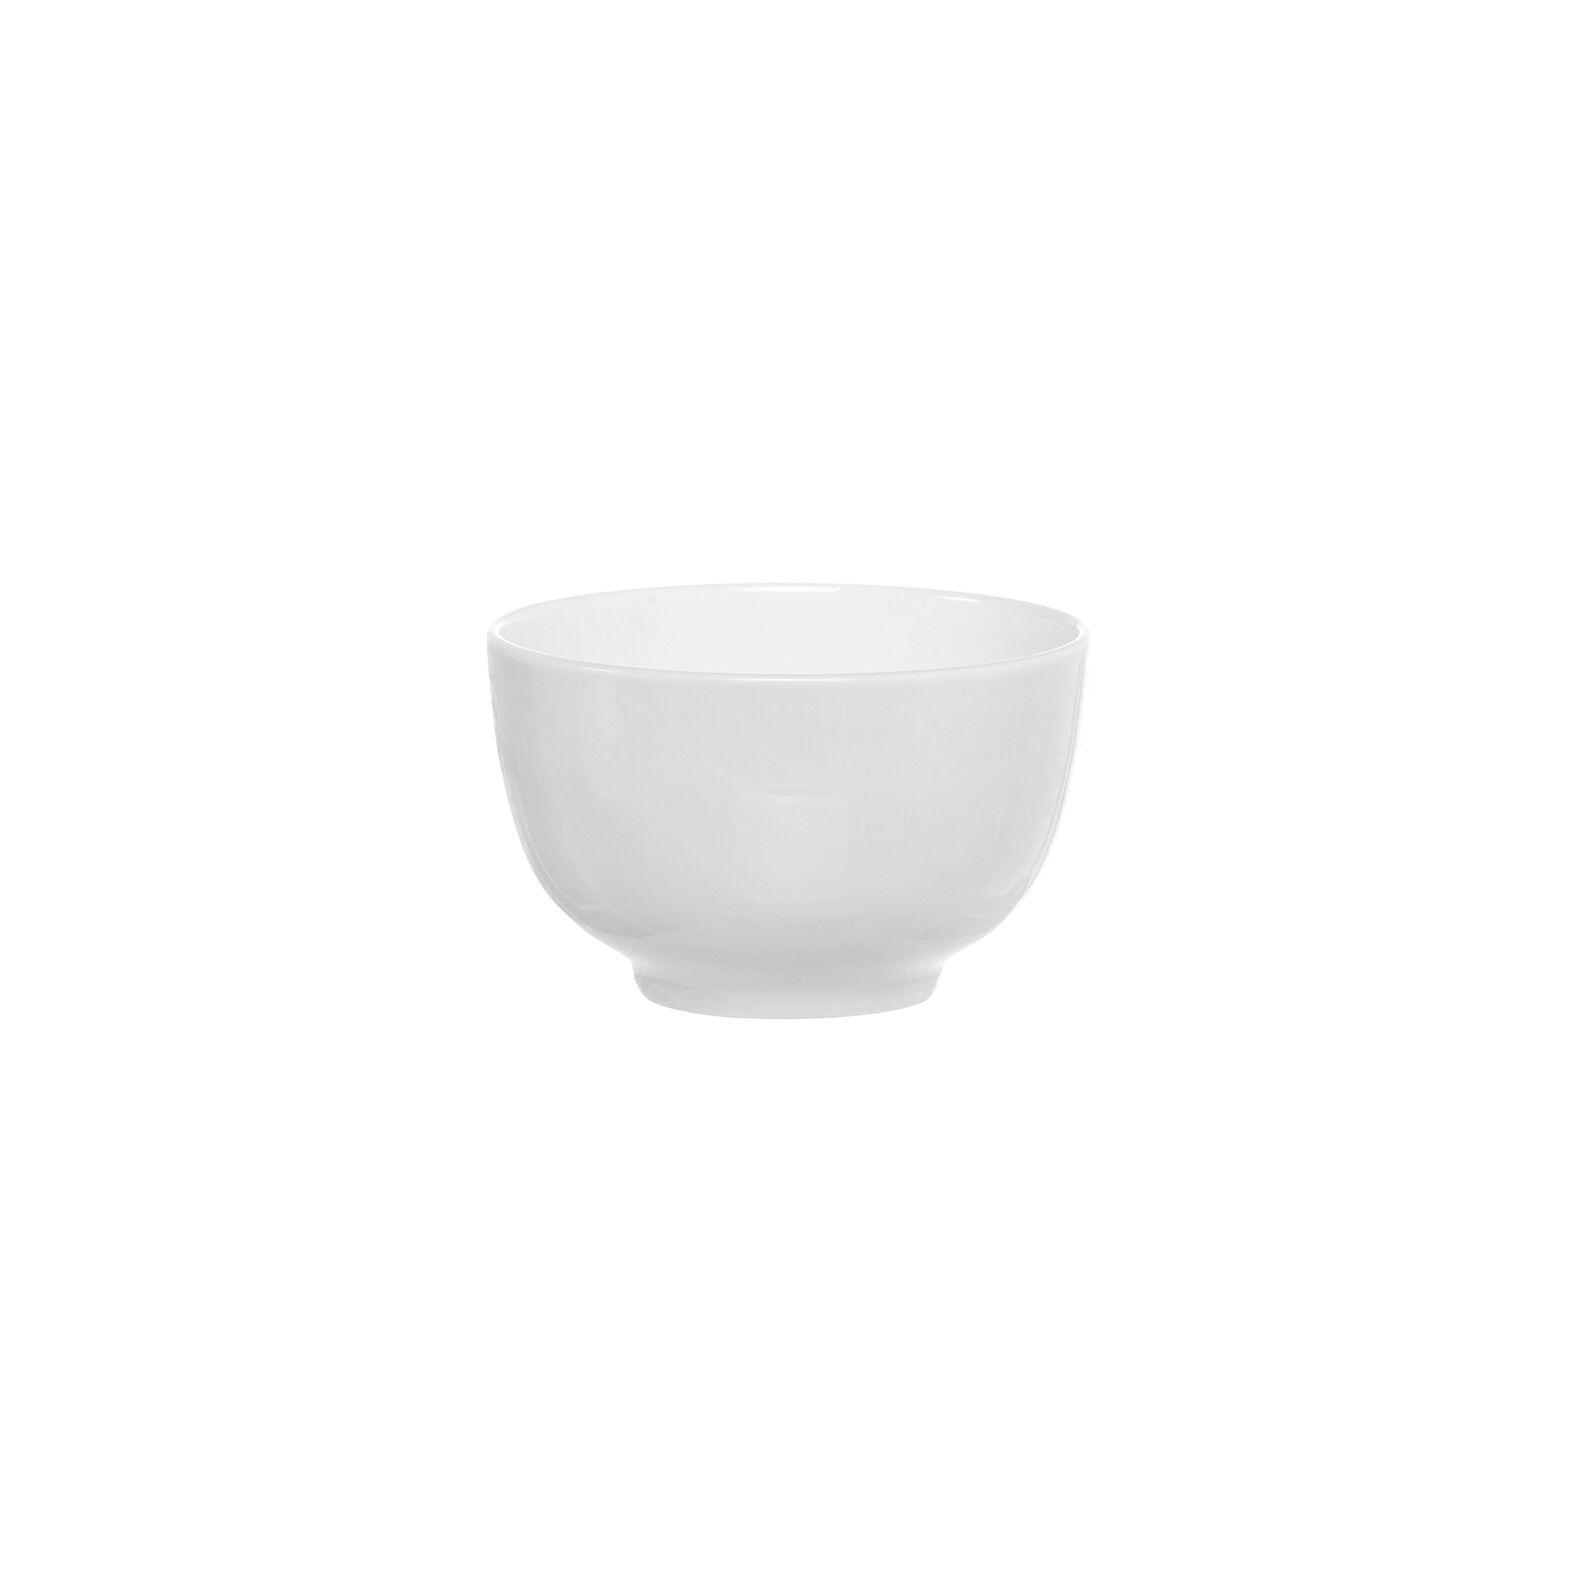 Anna porcelain dish